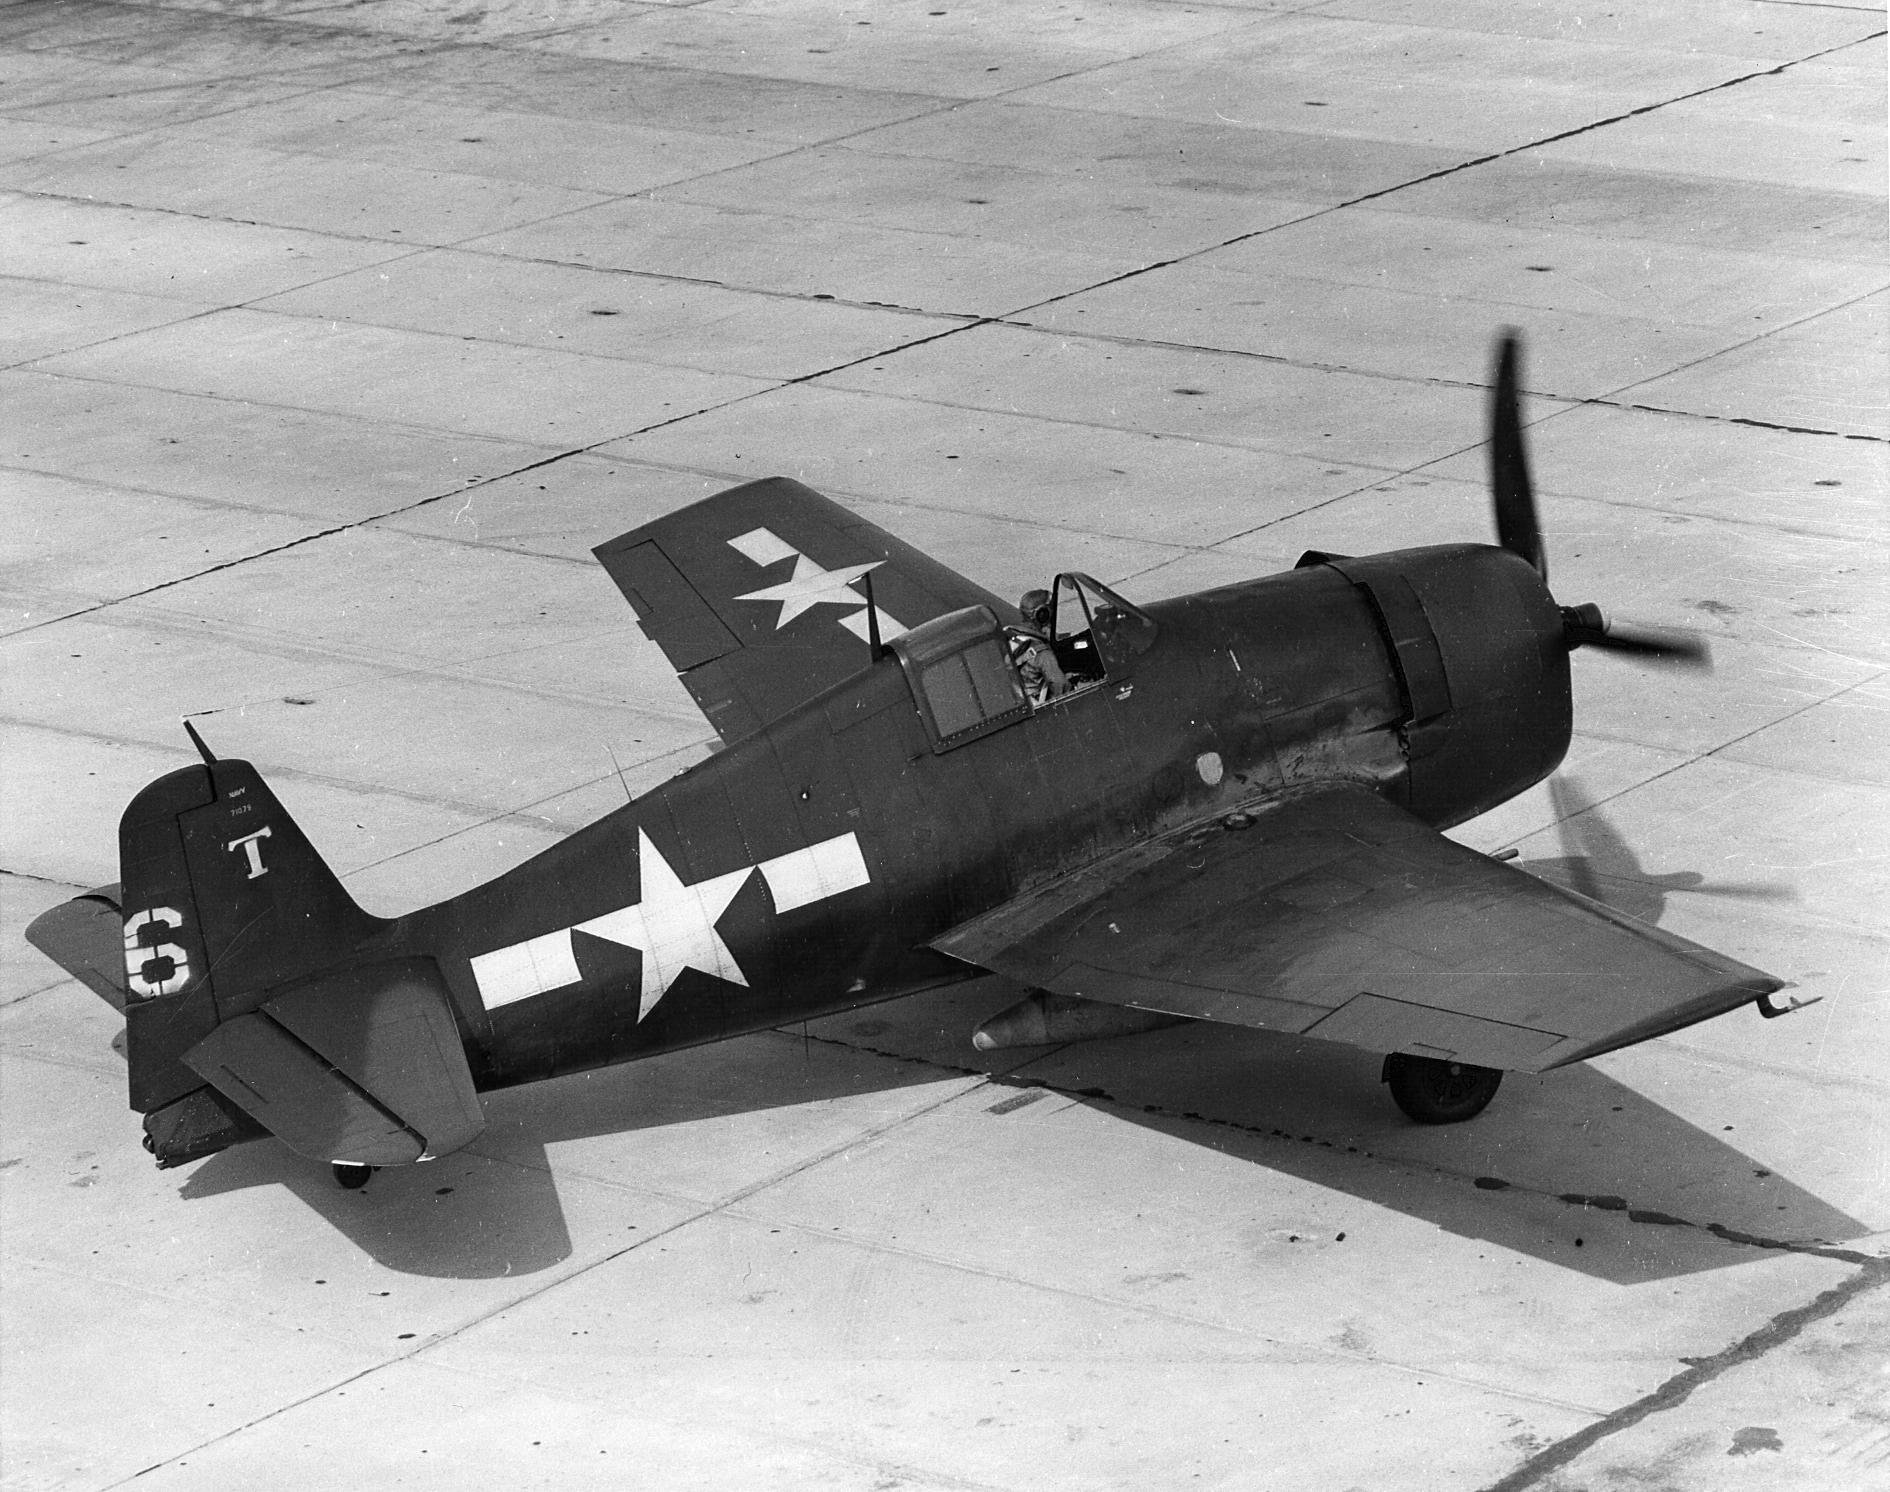 Grumman F6F 3 Hellcat VF 42 White T6 on the ground at Atlantic City NJ 01